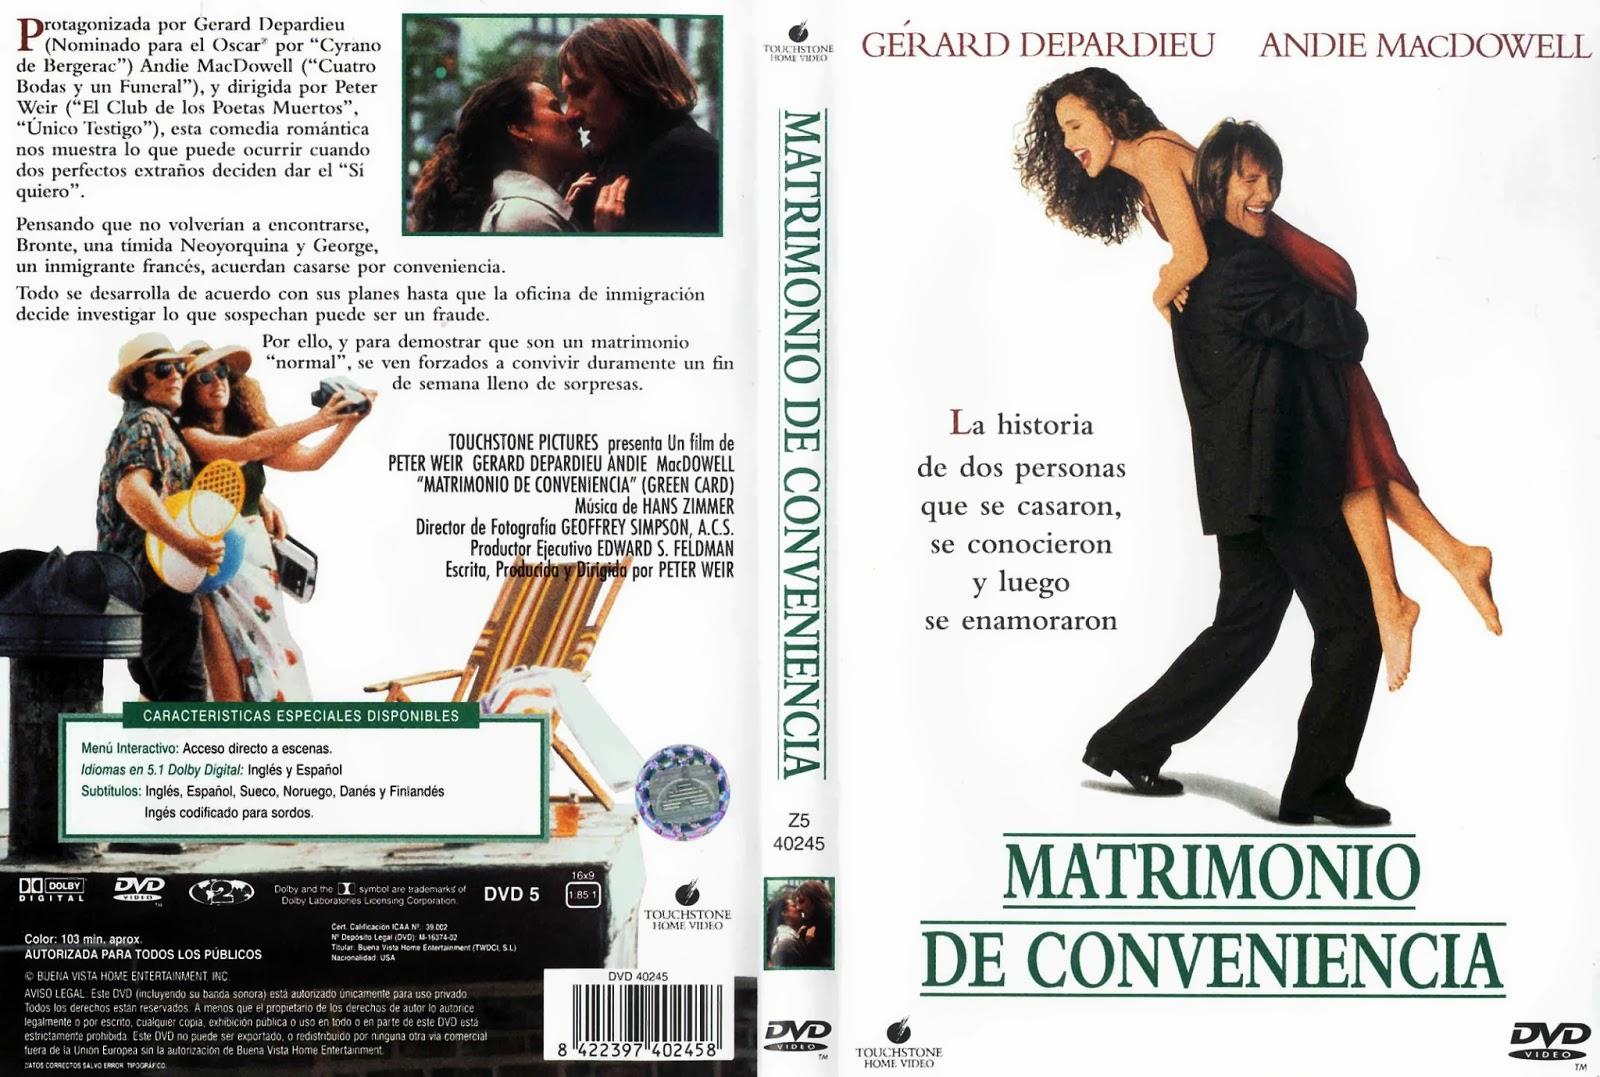 Matrimonio Por Conveniencia : Matrimonio de conveniencia